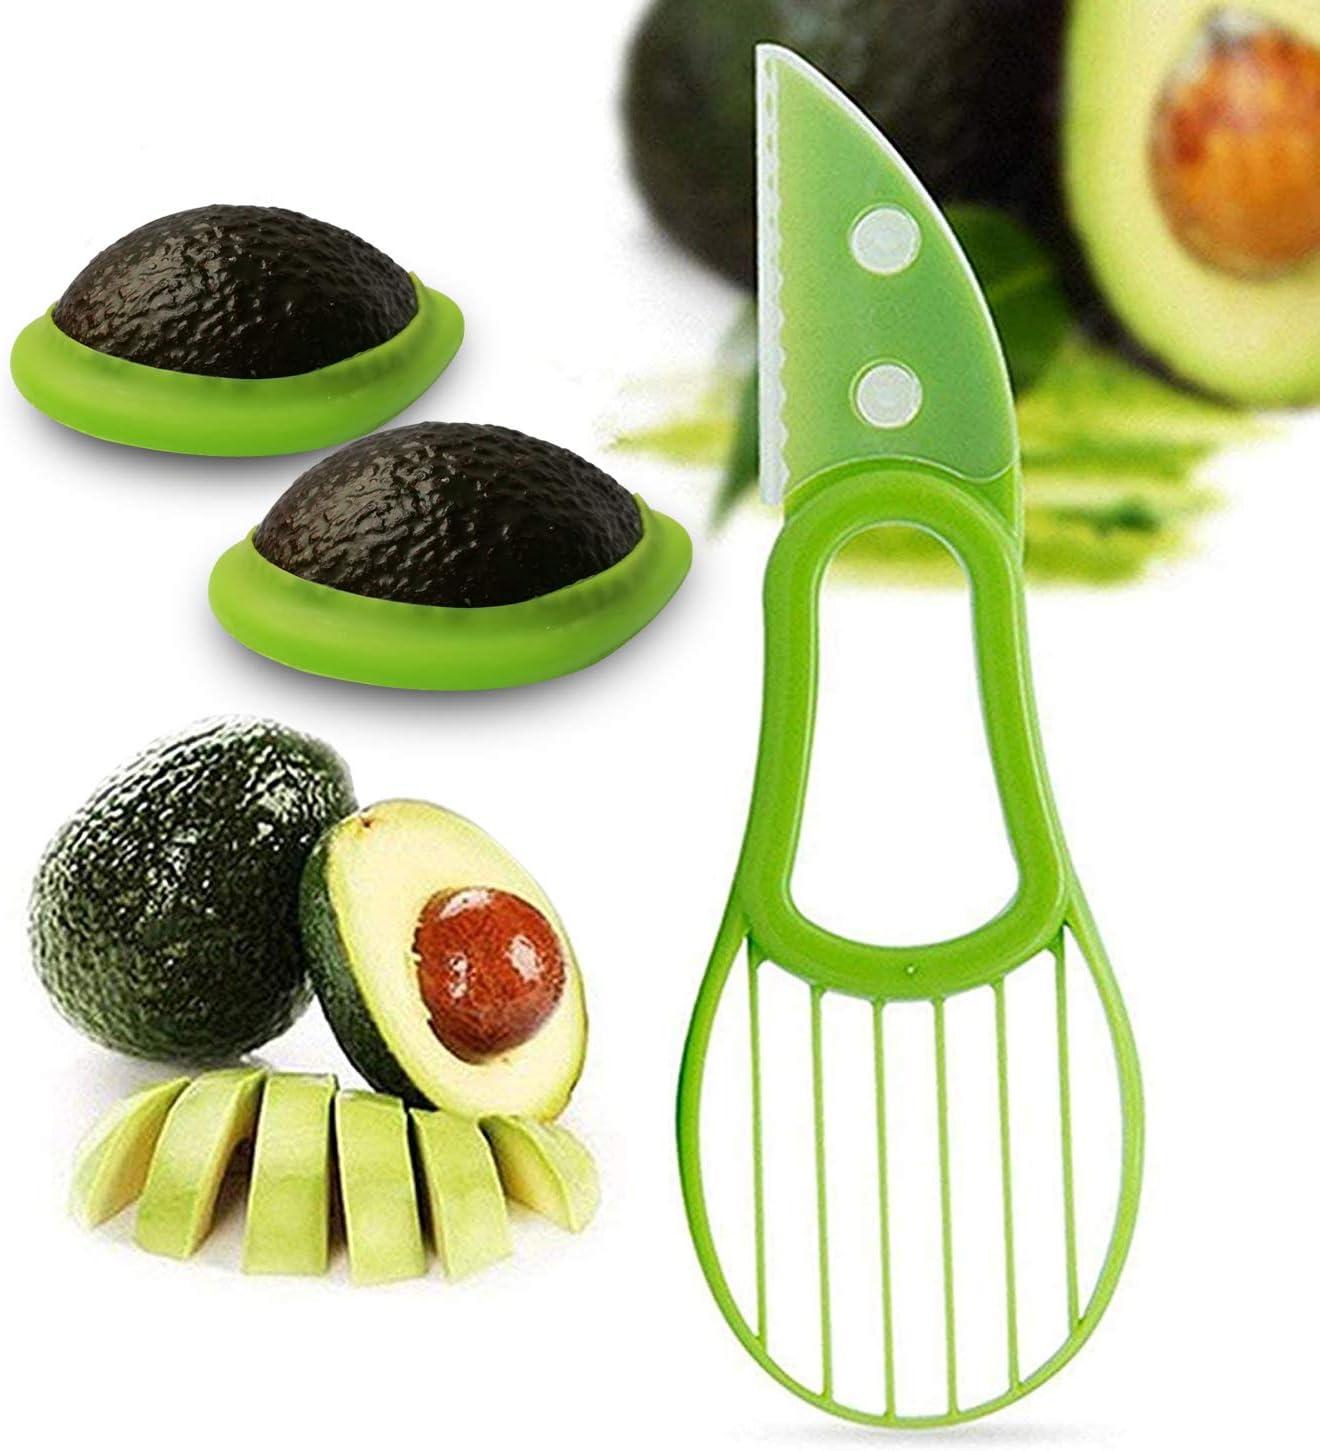 Avocado Saver and Slicer 3 in 1 / Avocado Holder/Keeper Storage